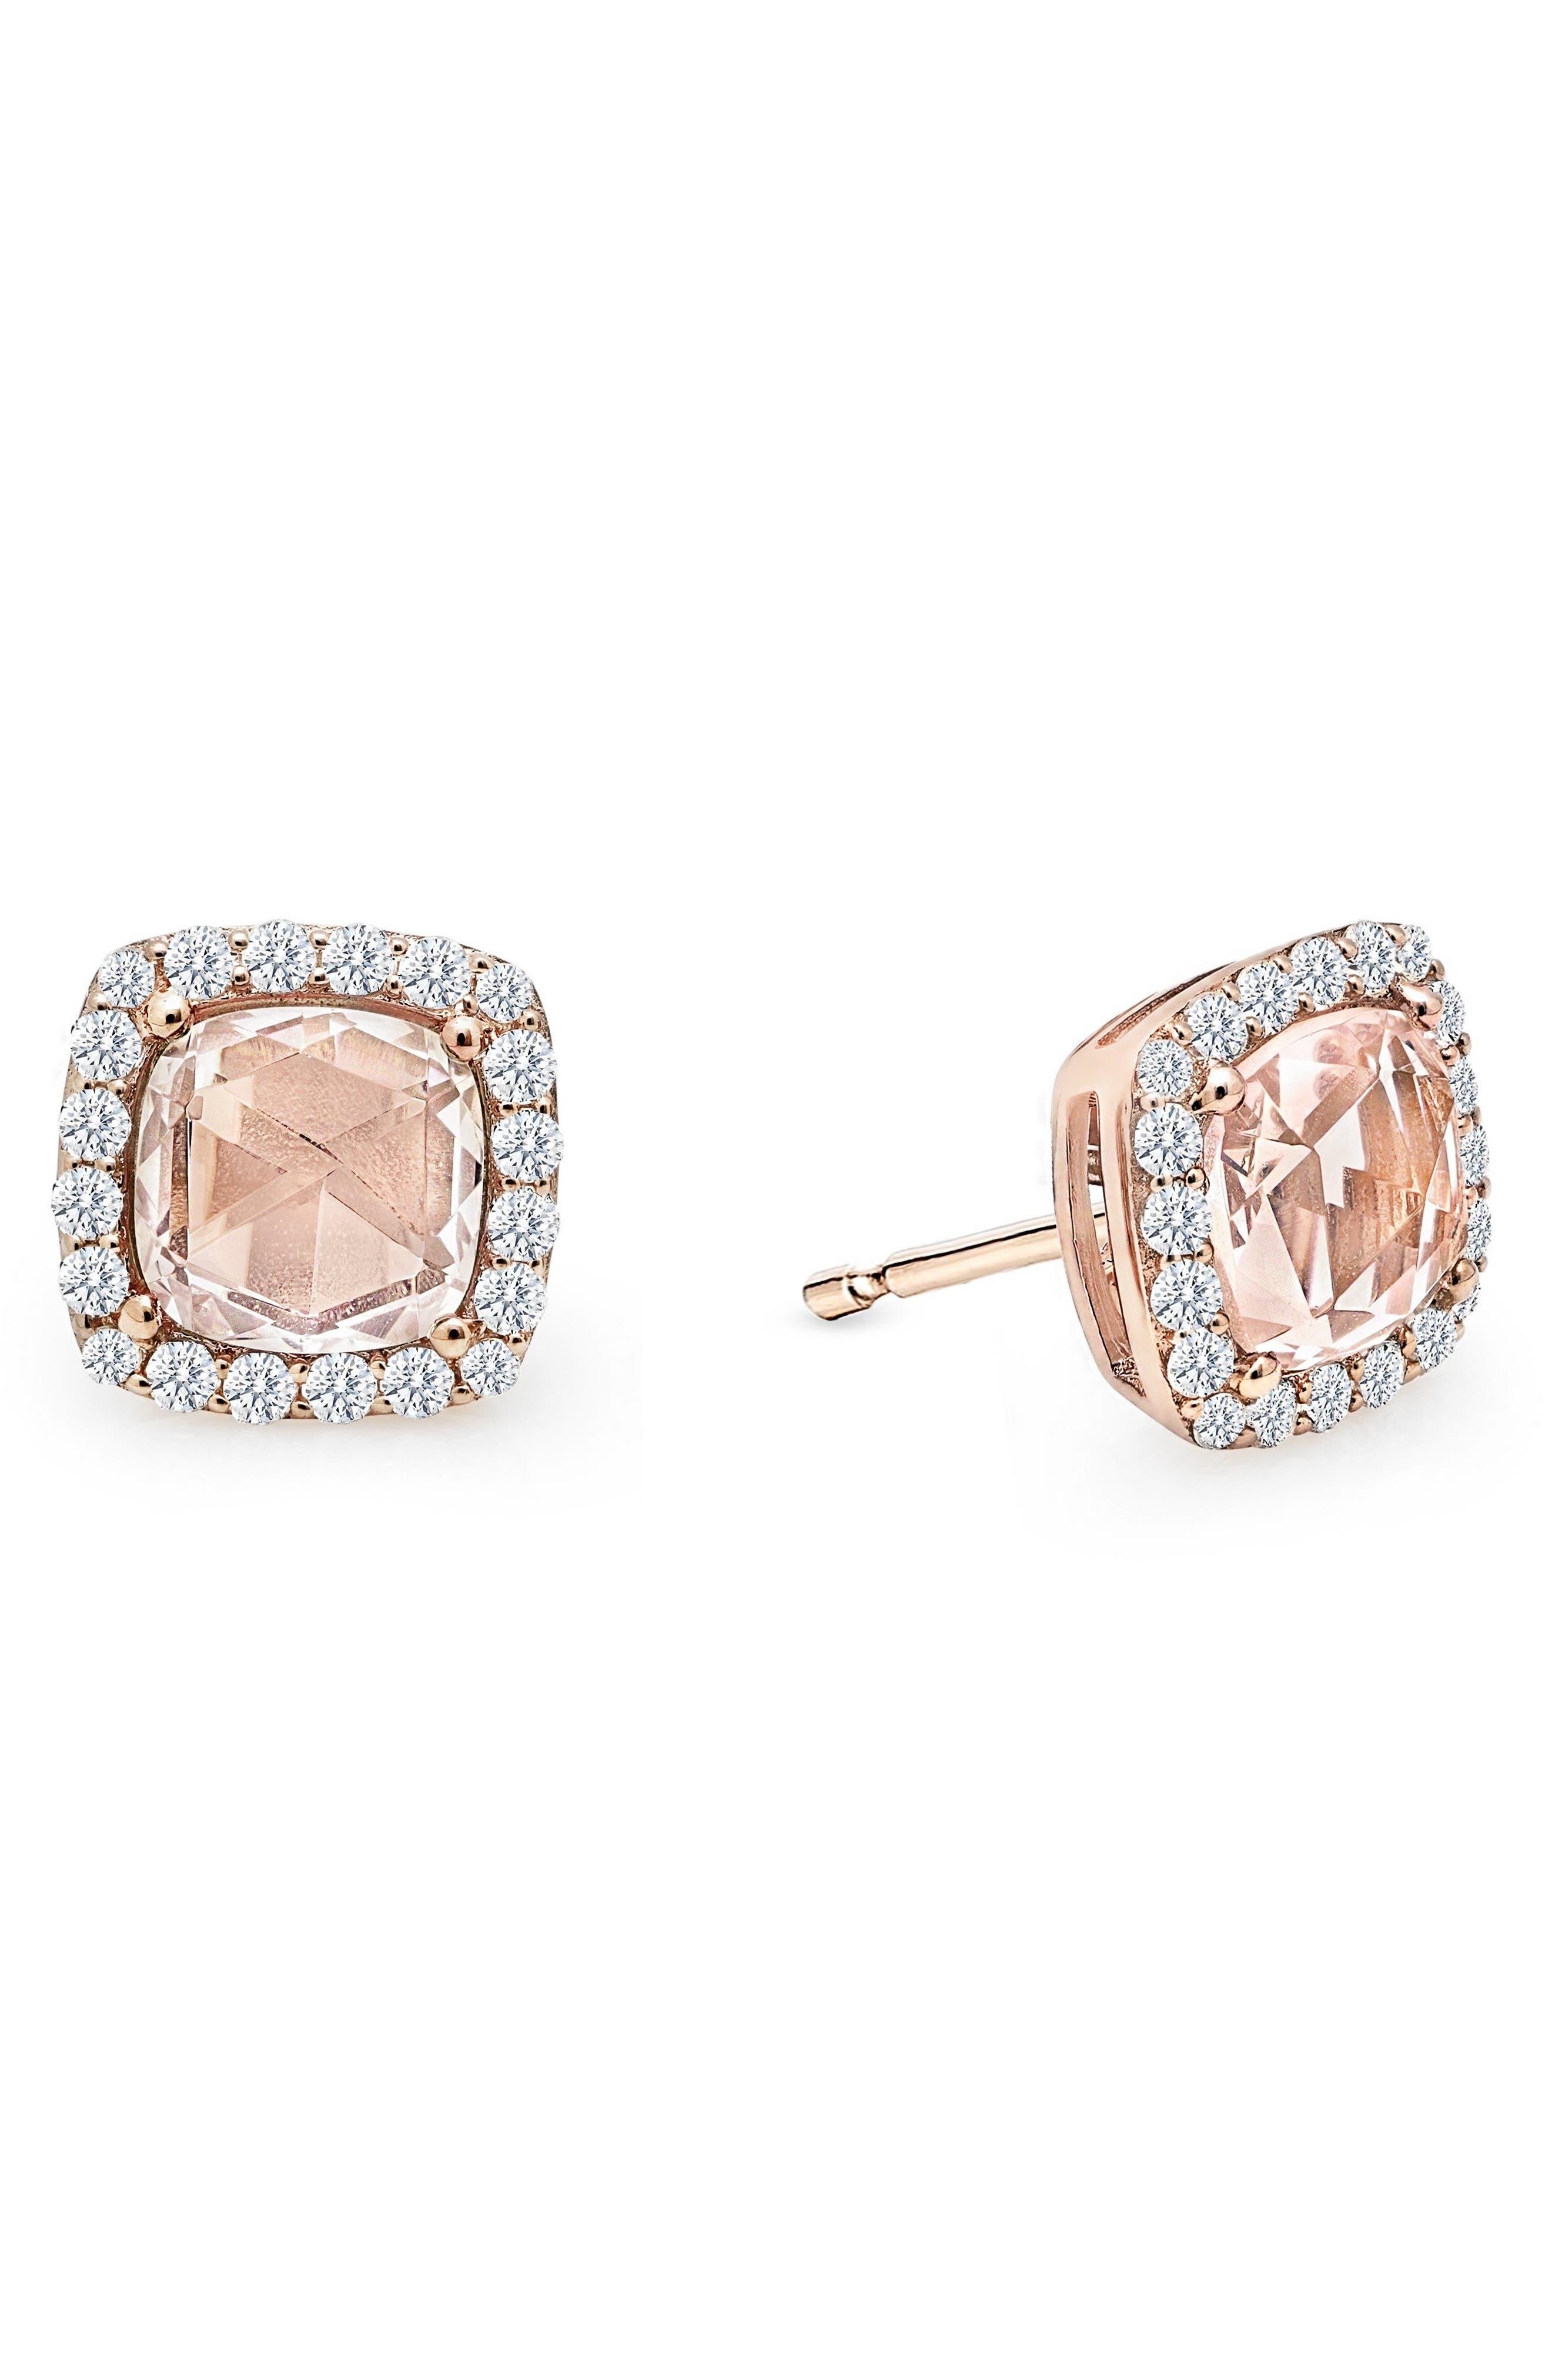 Lafonn Simulated Diamond & Simulated Morganite Stud Earrings